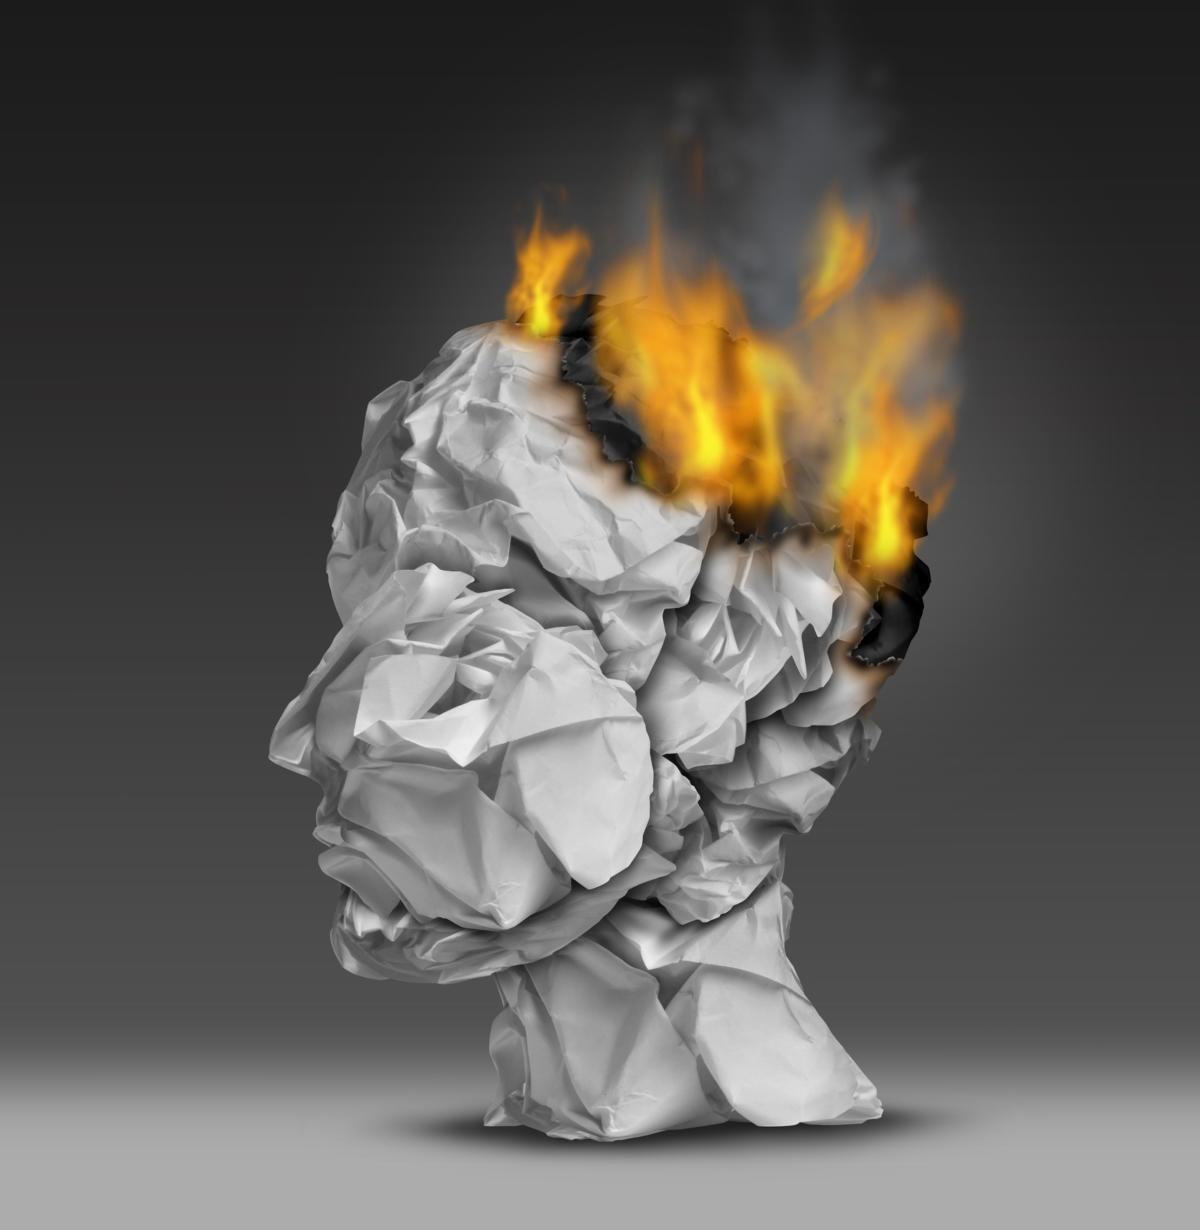 Burnout and Compassion Fatigue